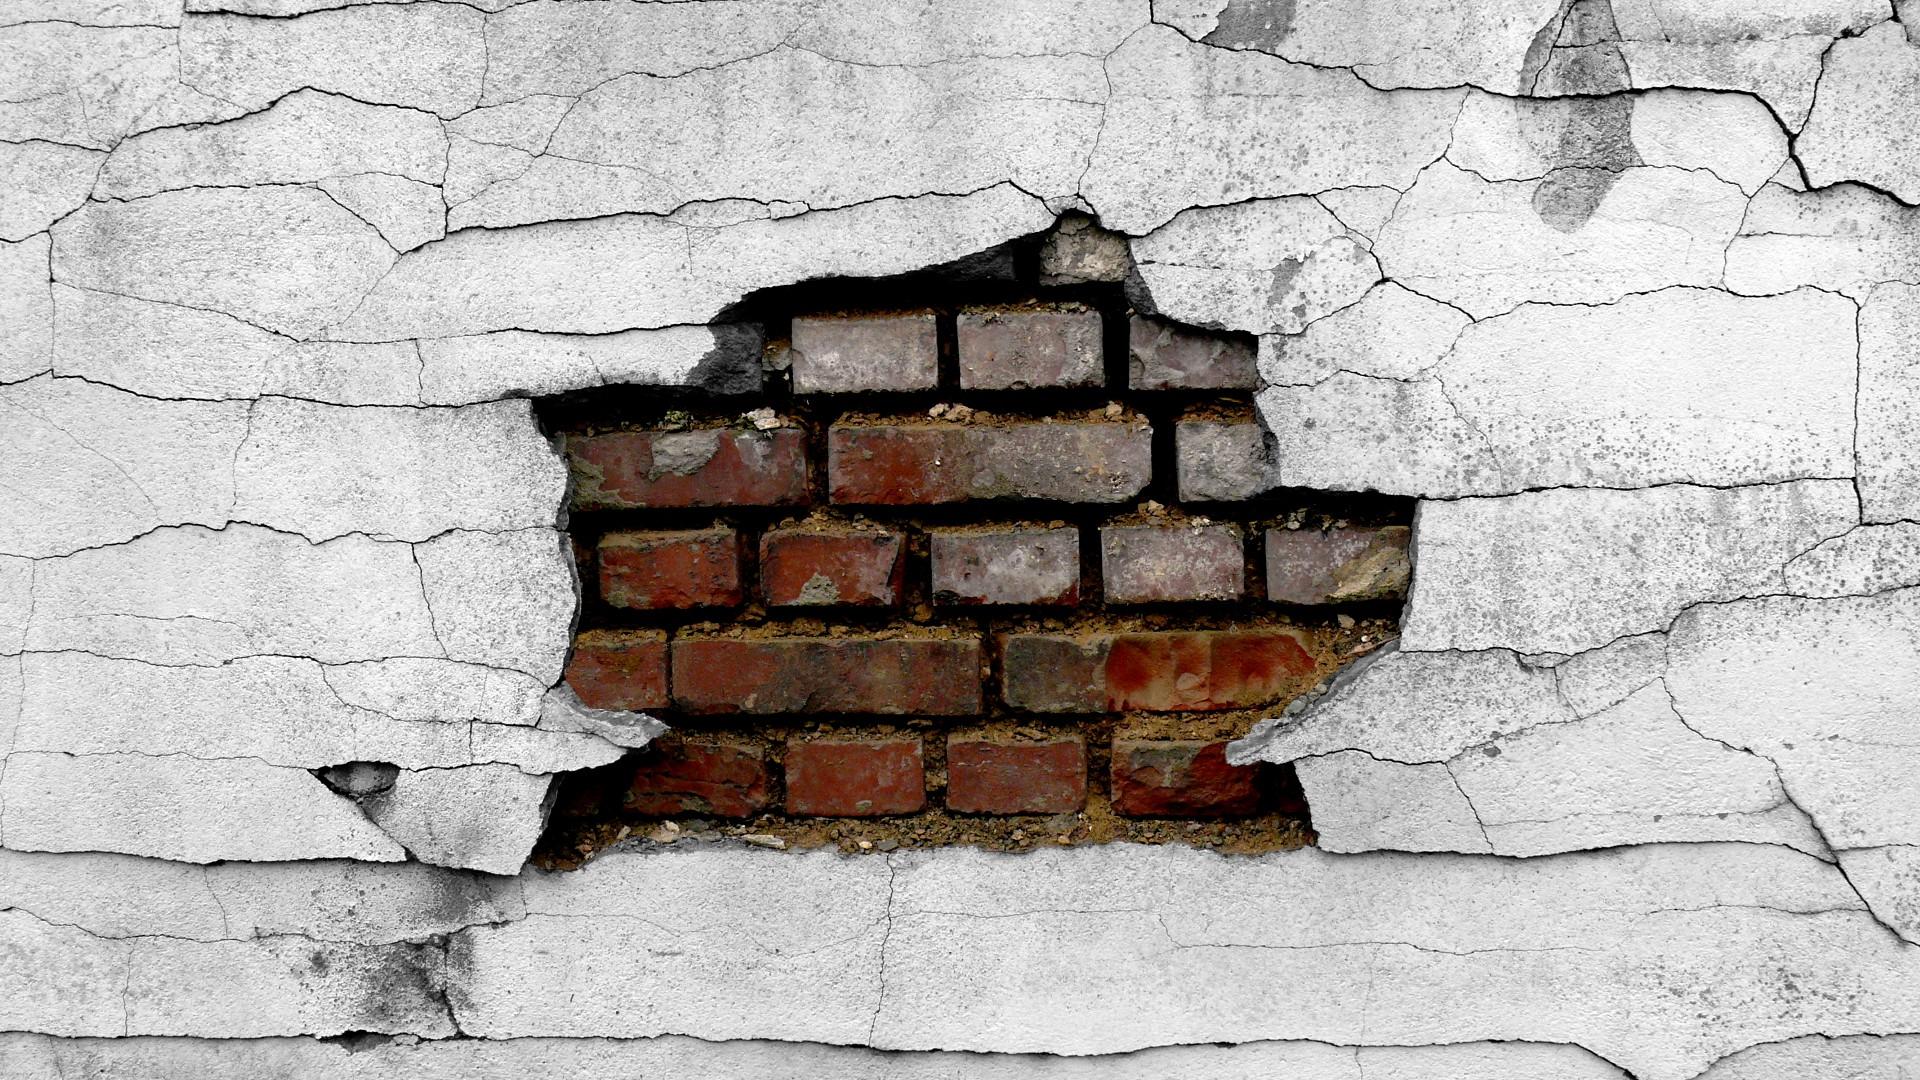 1920x1080 Wall Cracked Broken Brick Wall Wallpaper 1920x1080 48640